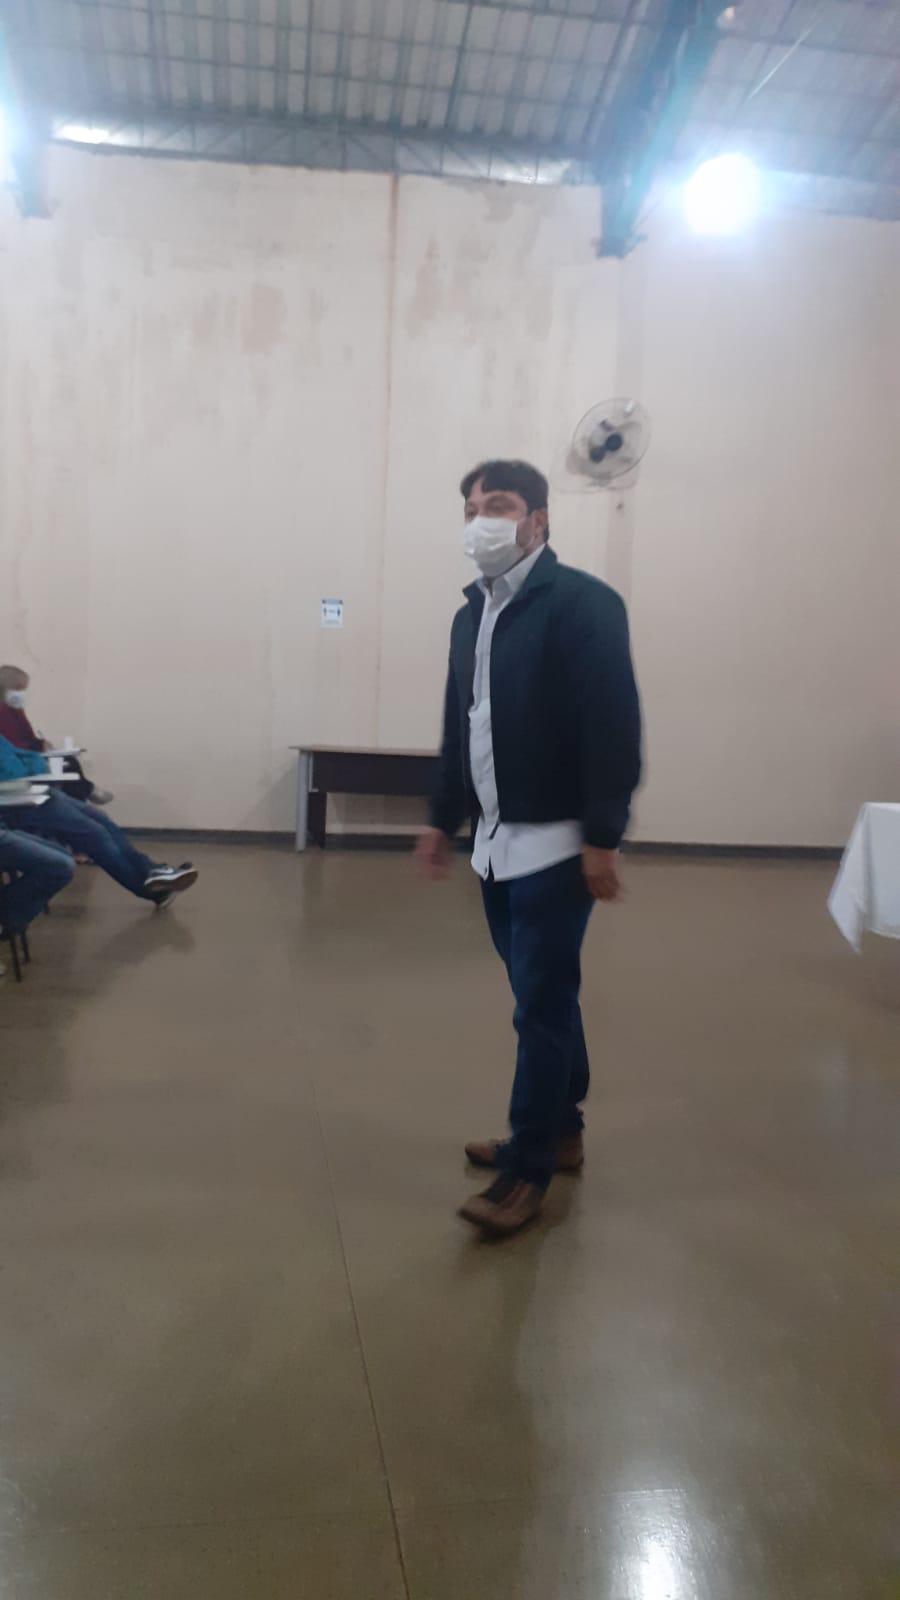 Estudantes participam de palestra sobre e-commerce e logística pós pandemia